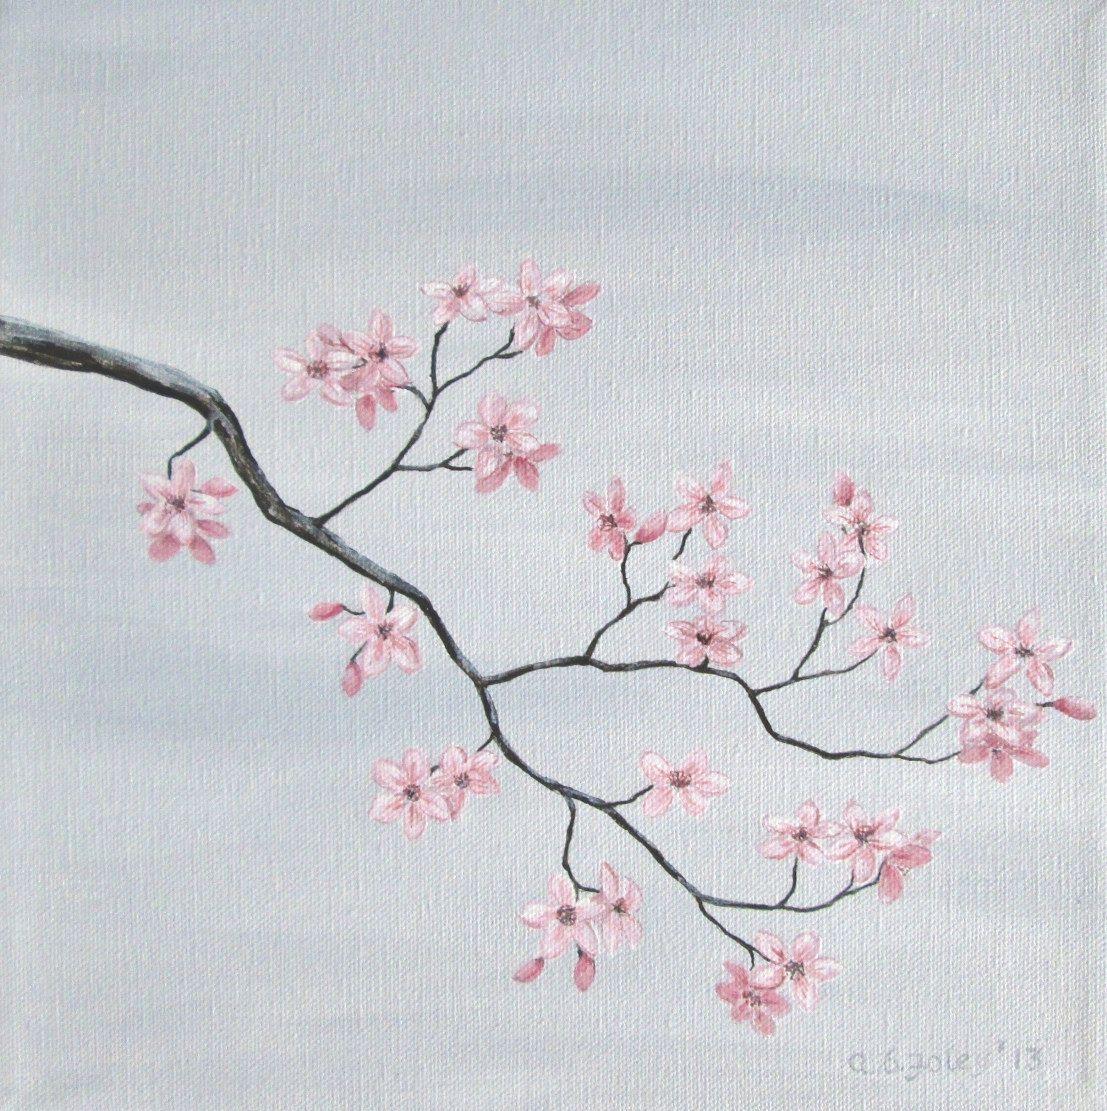 Cherry Blossom Painting Pink Cherry Blossoms Original Fine Etsy Cherry Blossom Painting Blossoms Art Original Fine Art